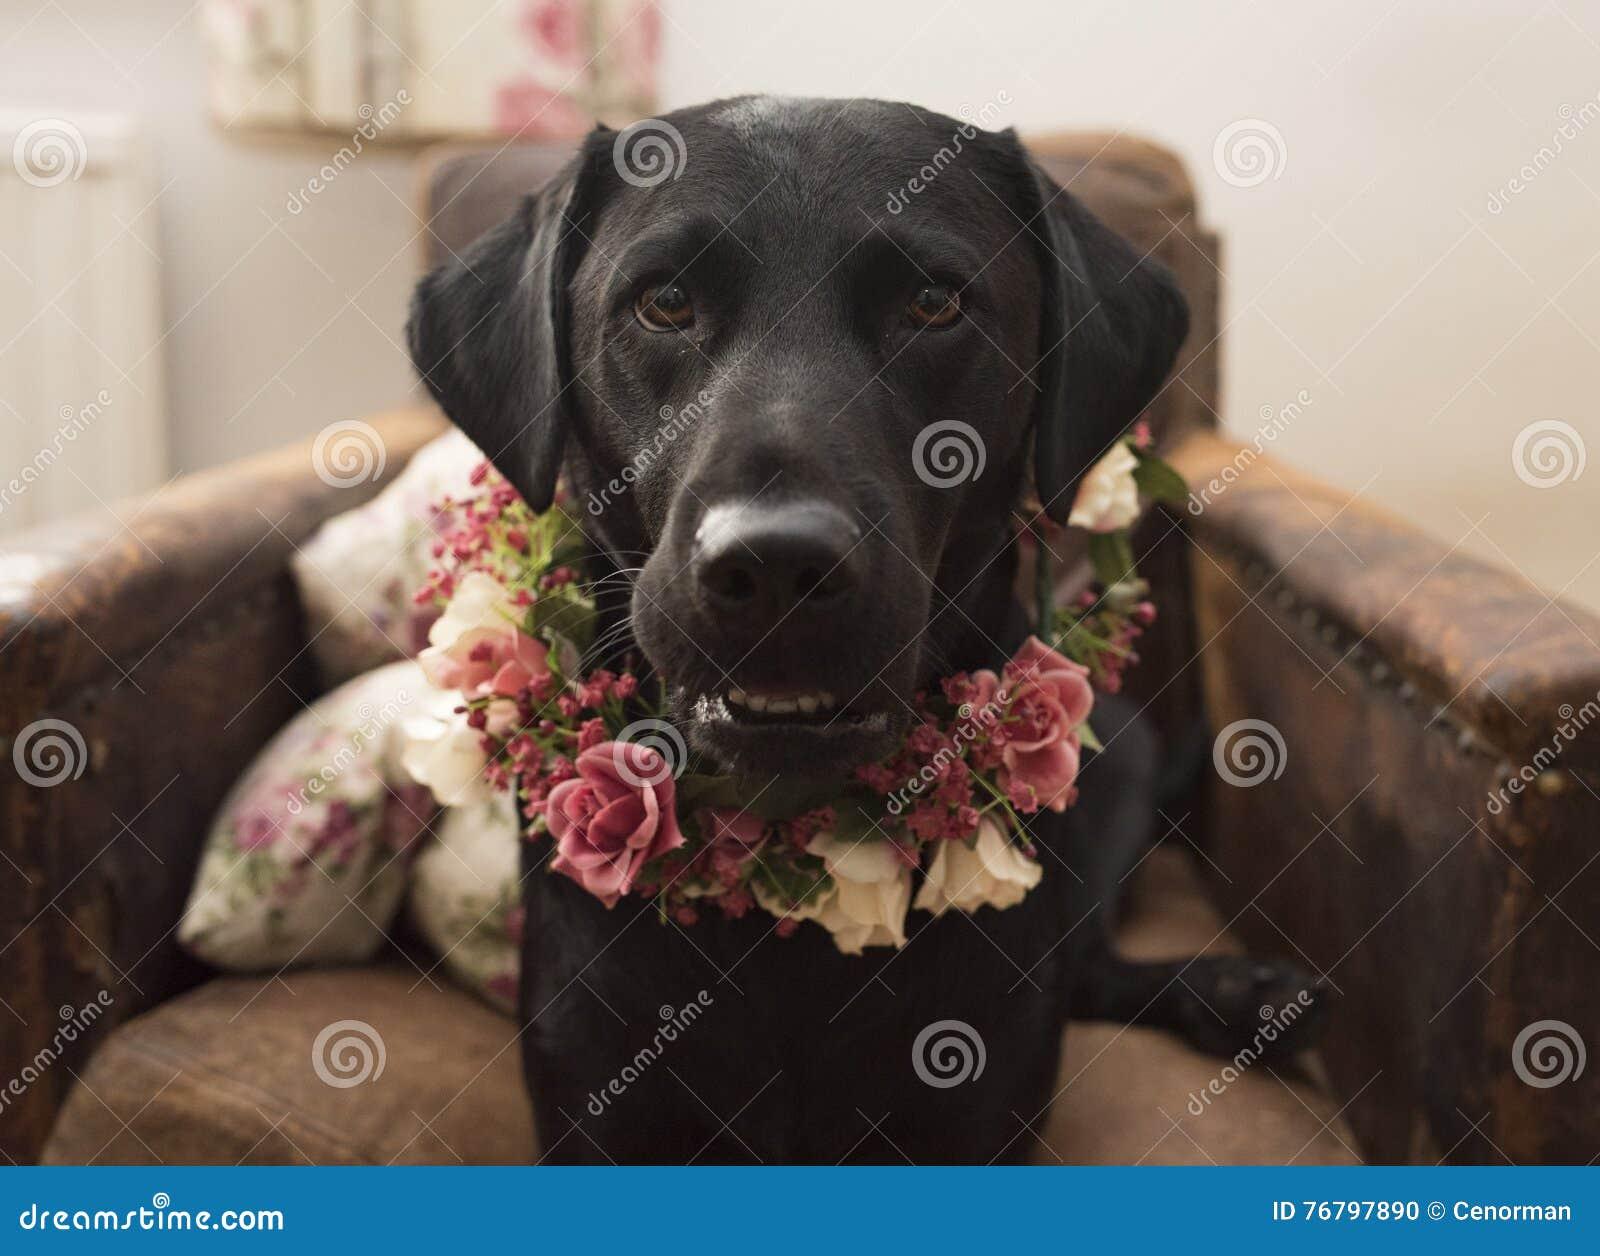 Labrador in flower crown collar stock photo image of black floral labrador in flower crown collar izmirmasajfo